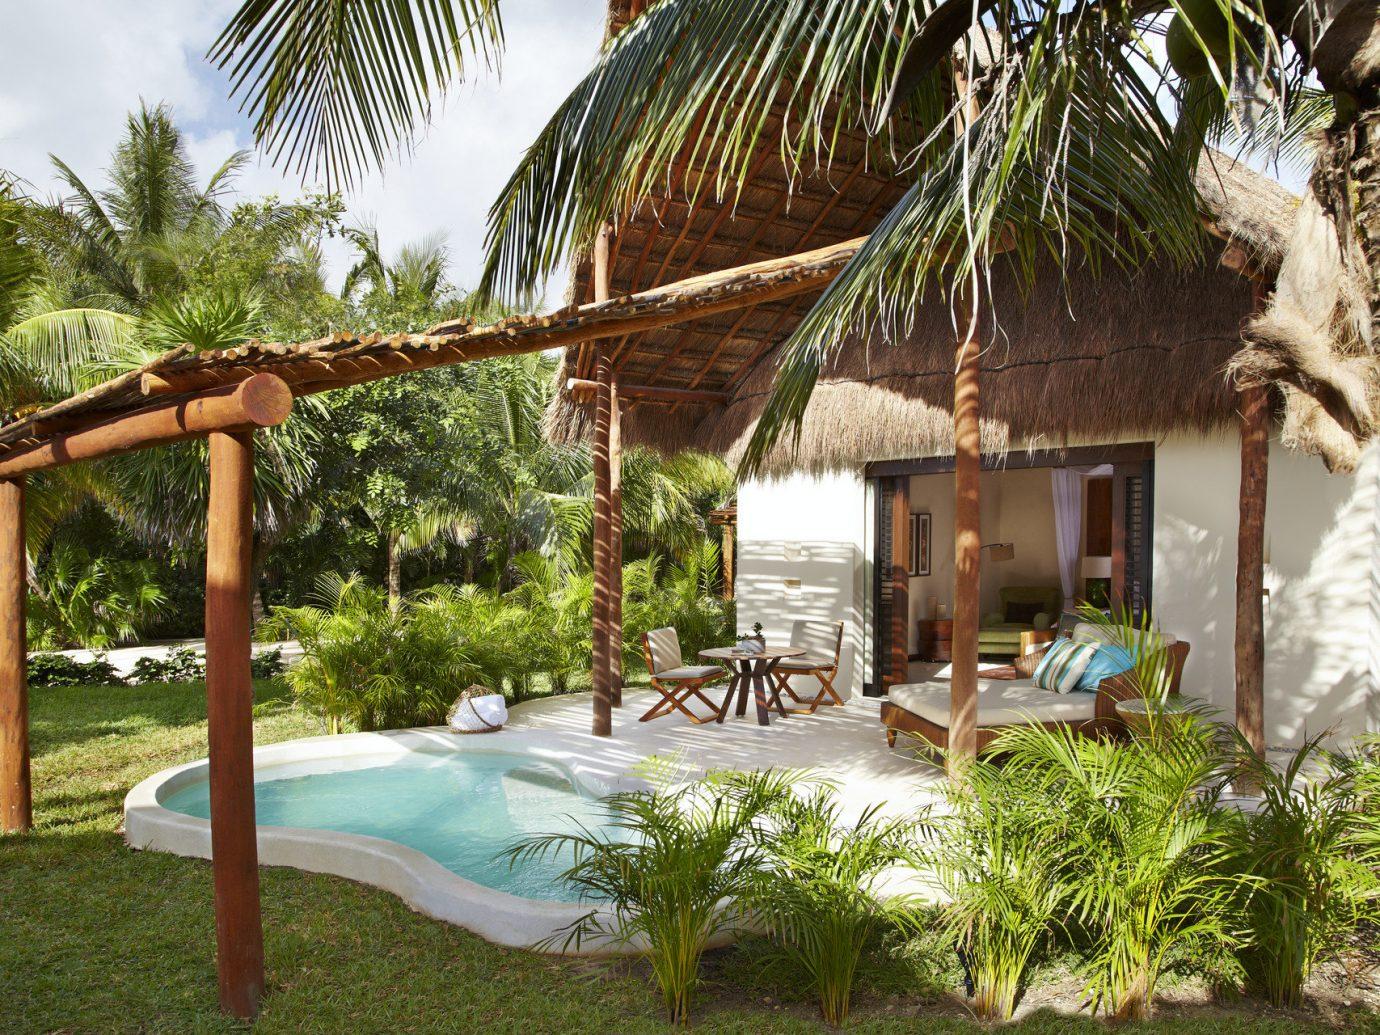 Beauty Hotels Trip Ideas tree outdoor property Resort vacation plant estate Villa Jungle backyard eco hotel hacienda area cottage lawn outdoor structure palm shade furniture Garden